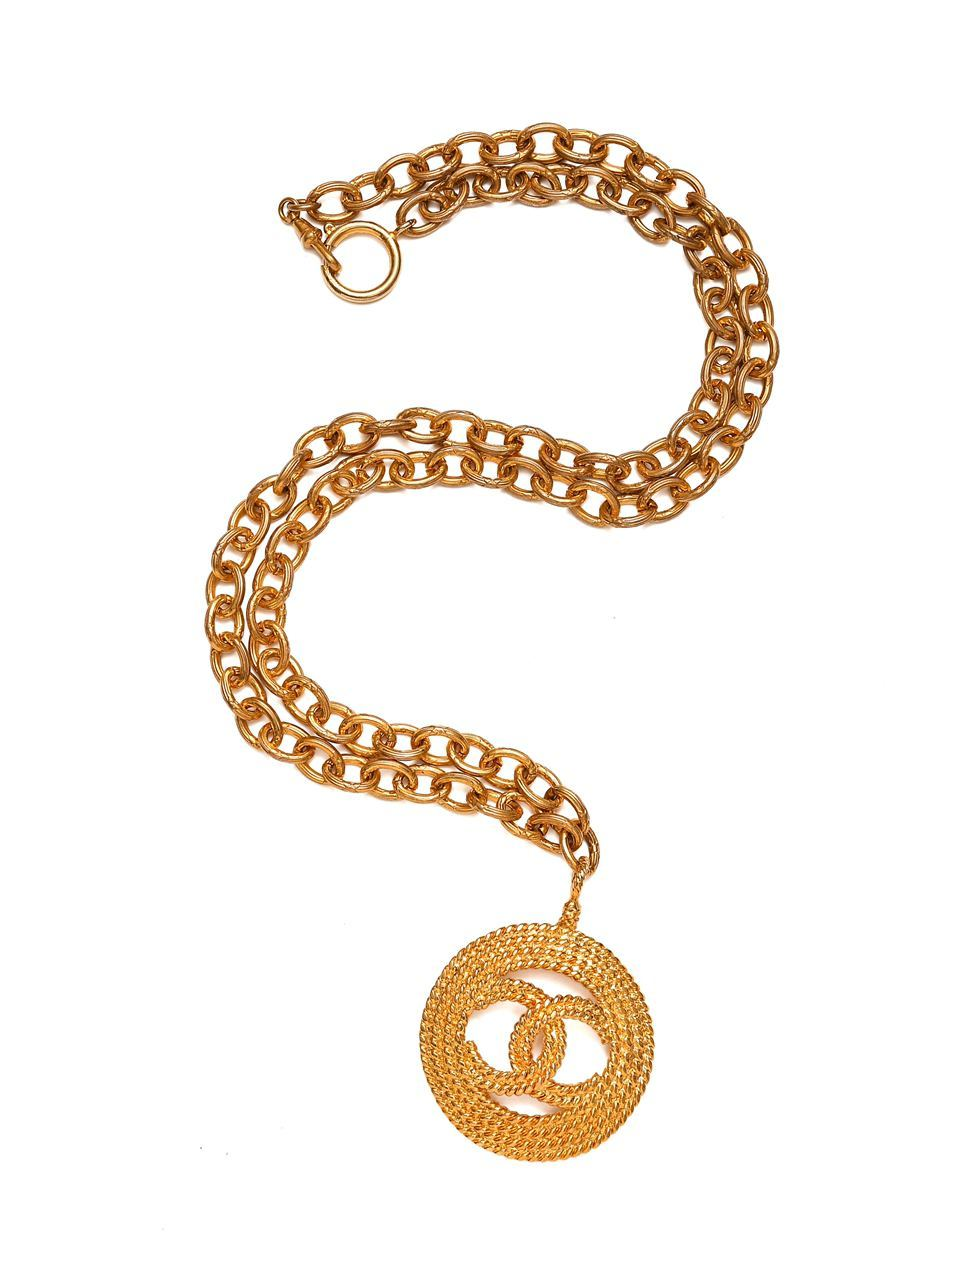 Кулон на цепи Chanel 1985 г., покрытый 24-х каратным золотом